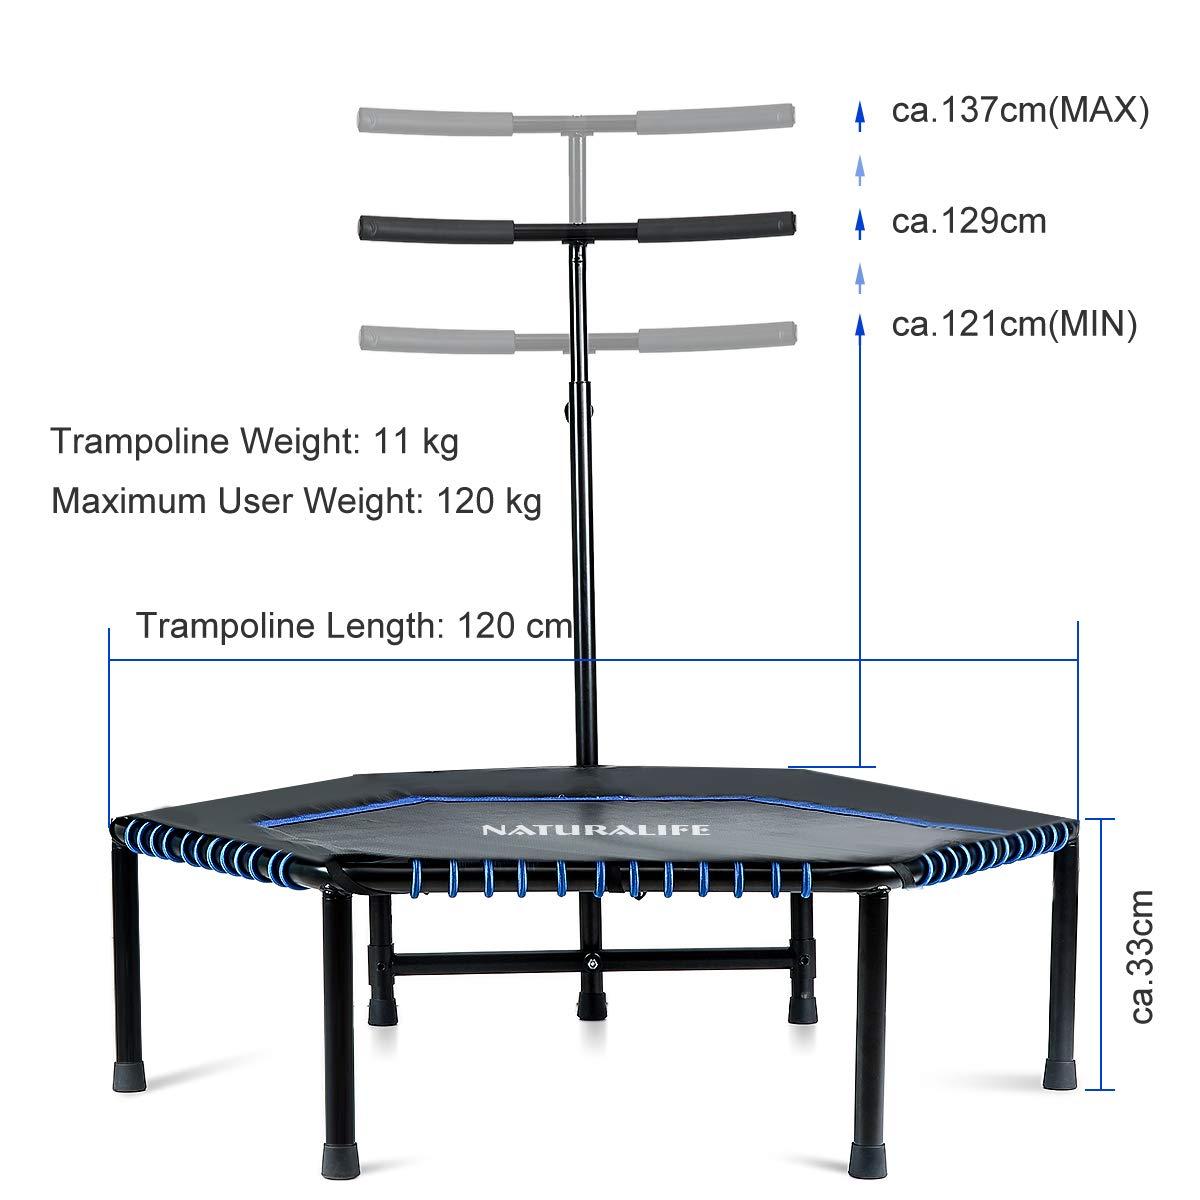 NATURALIFE Mini trampolín Fitness con Manillar, Cama elástica ...